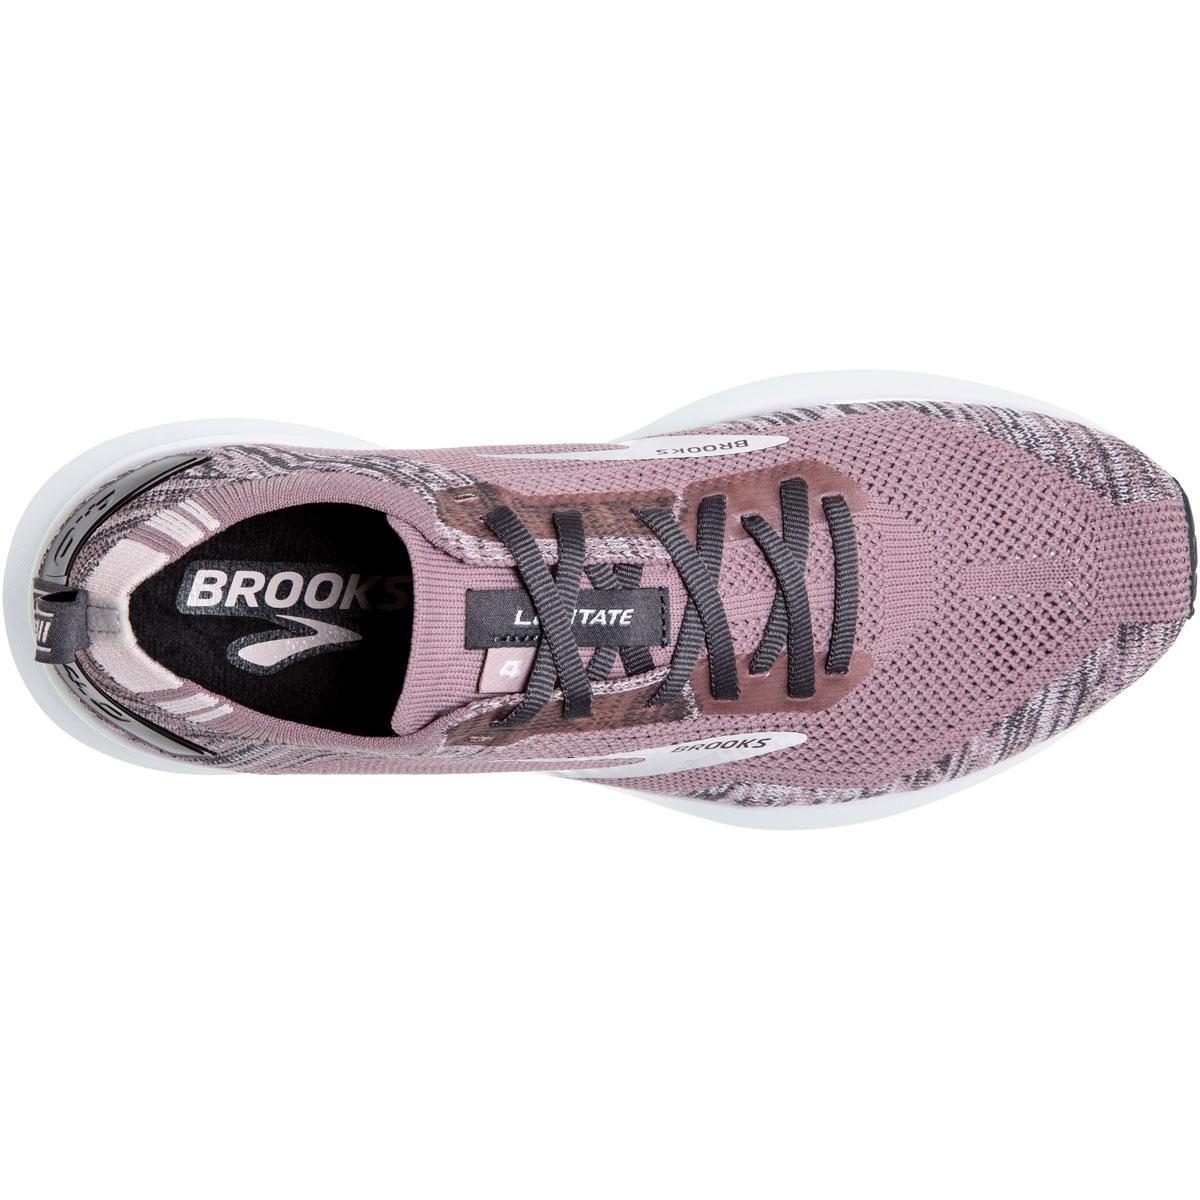 Women's Brooks Levitate 4 Running Shoe - Color: Blackened Pearl - Size: 5.5 - Width: Regular, Blackened Pearl, large, image 4